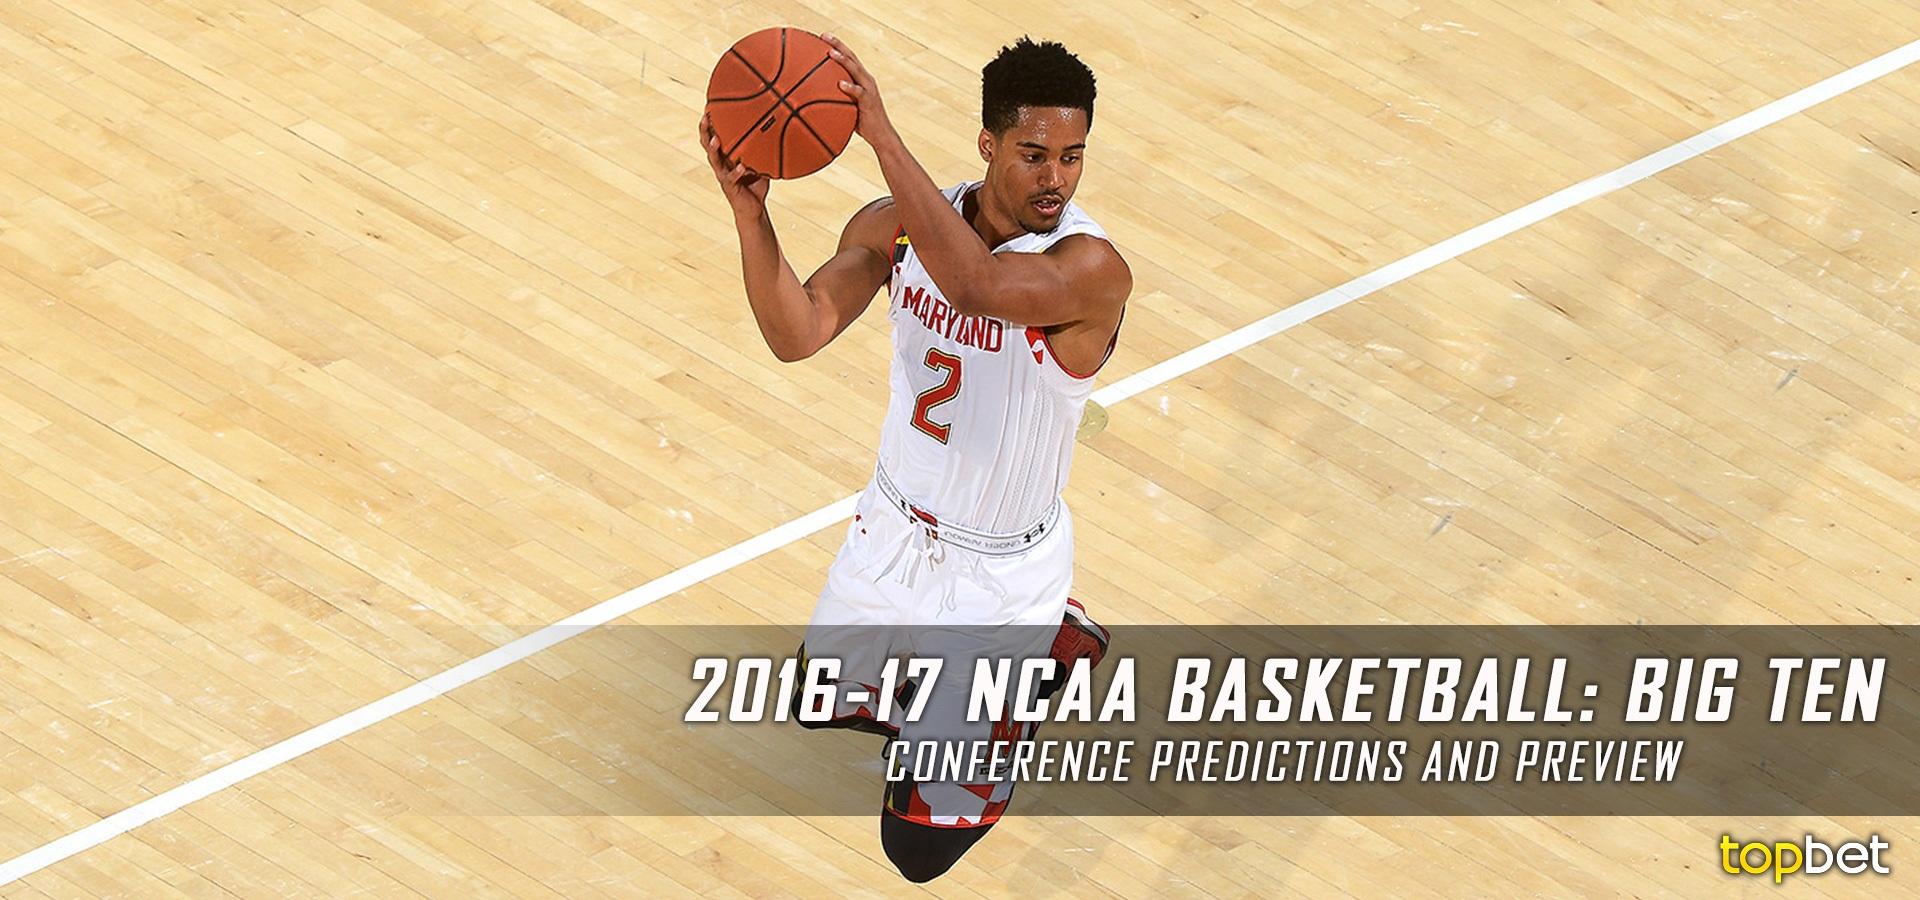 Kentucky Wildcats Basketball 2016 17 Season Preview: 2016-17 Big Ten College Basketball Predictions And Preview